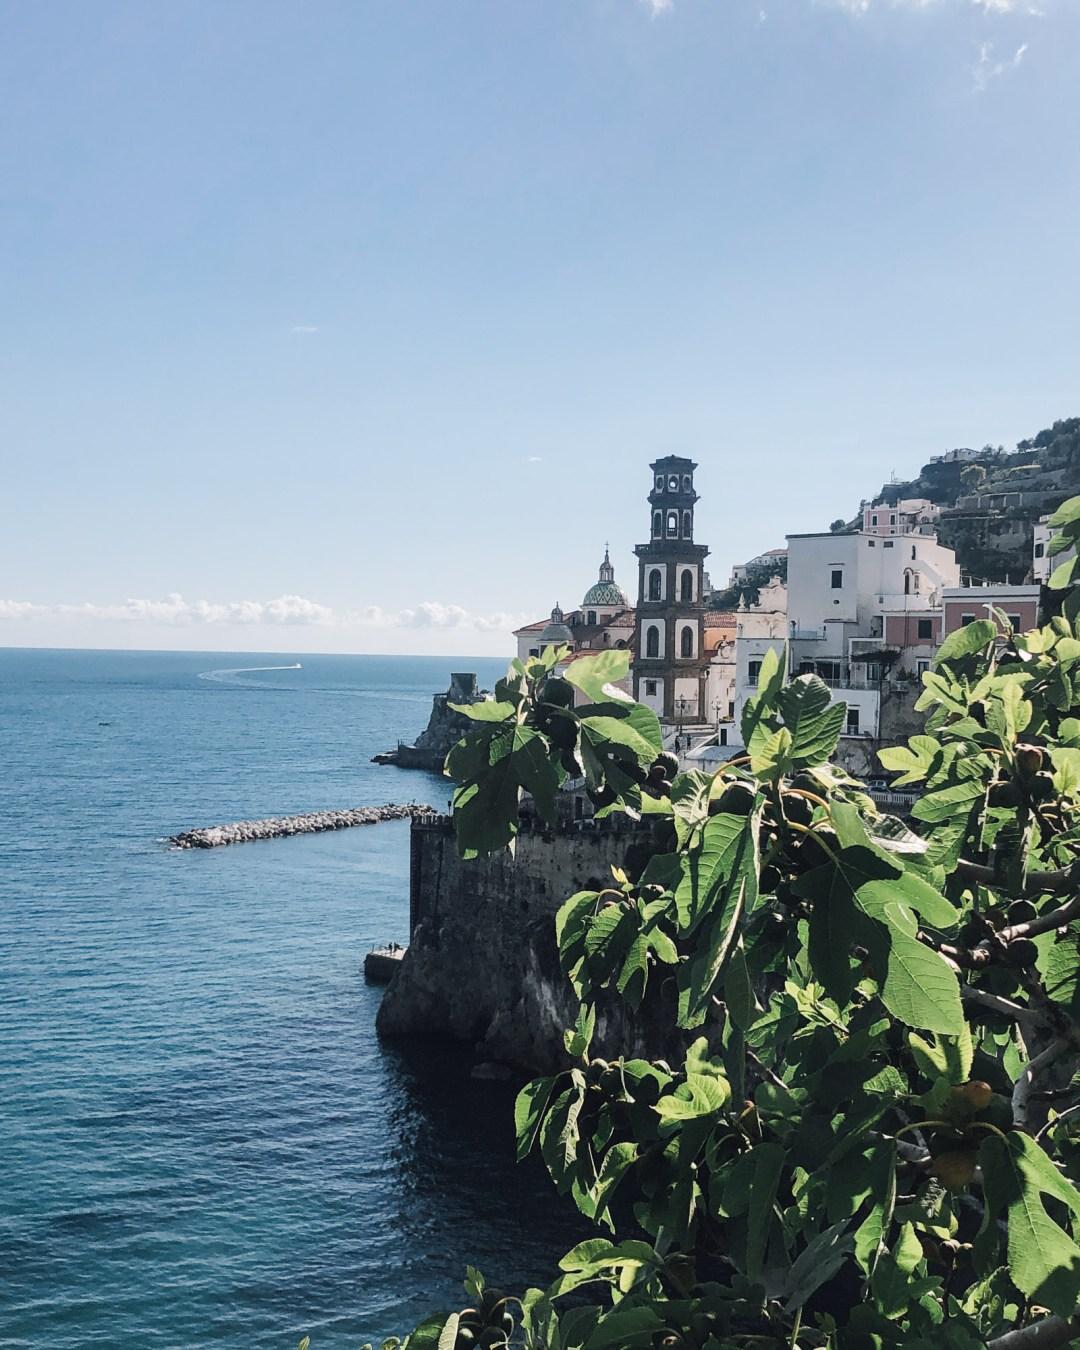 inastil, amalfikueste, urlaub, italien, sorrent, amalfi, positano, capri, luxusurlaub, cabrio, roadtrip, over50blogger, sommermode, ue50style, reiseblogger, reisebericht, traveldiary, reisetipps-21